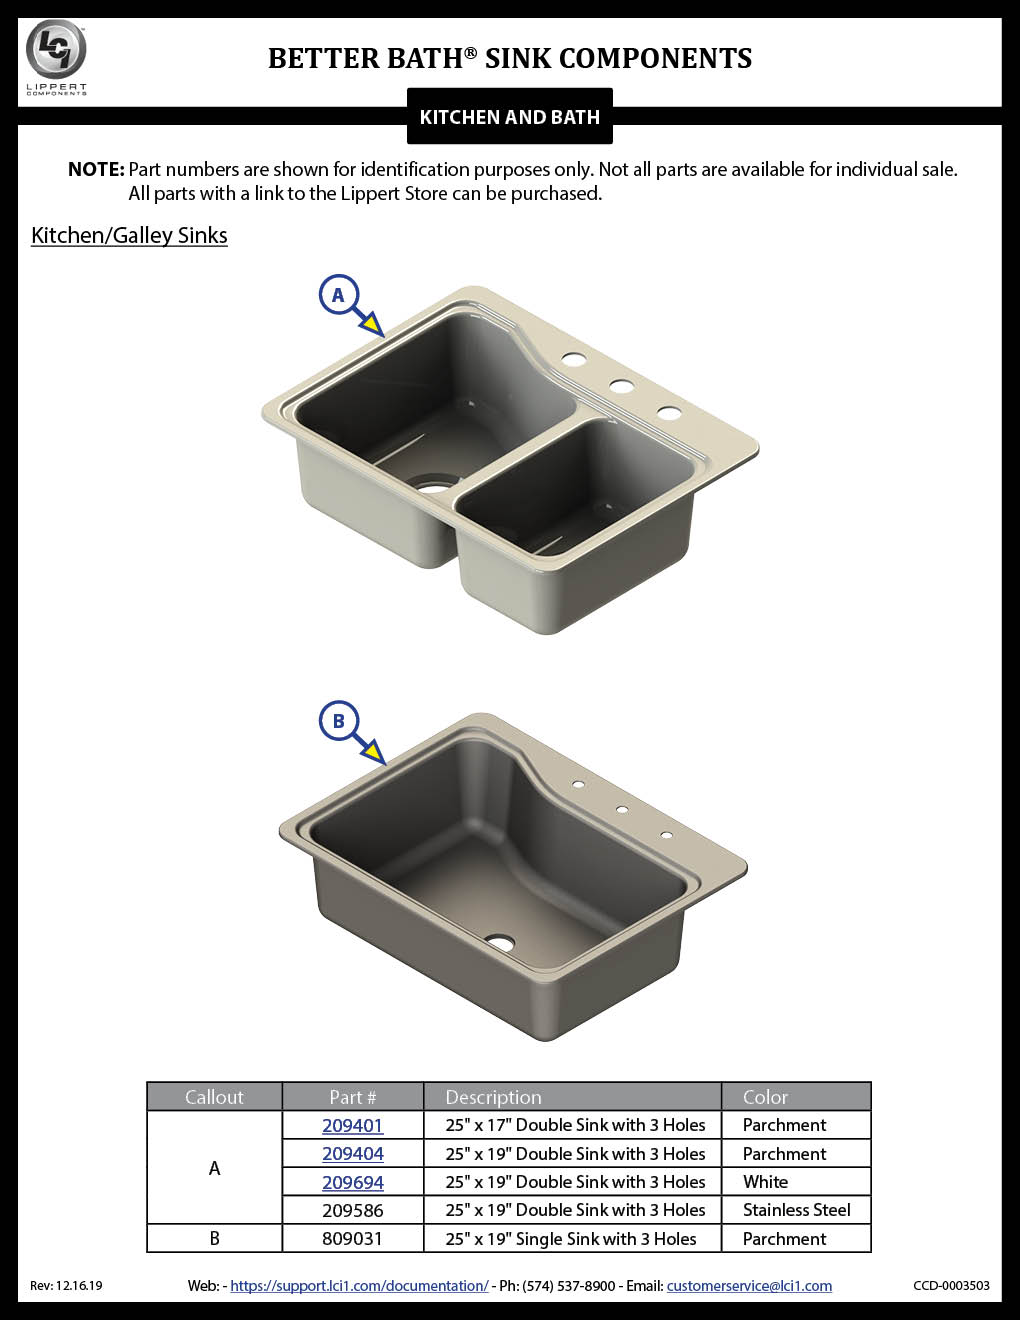 Better Bath Sink Components